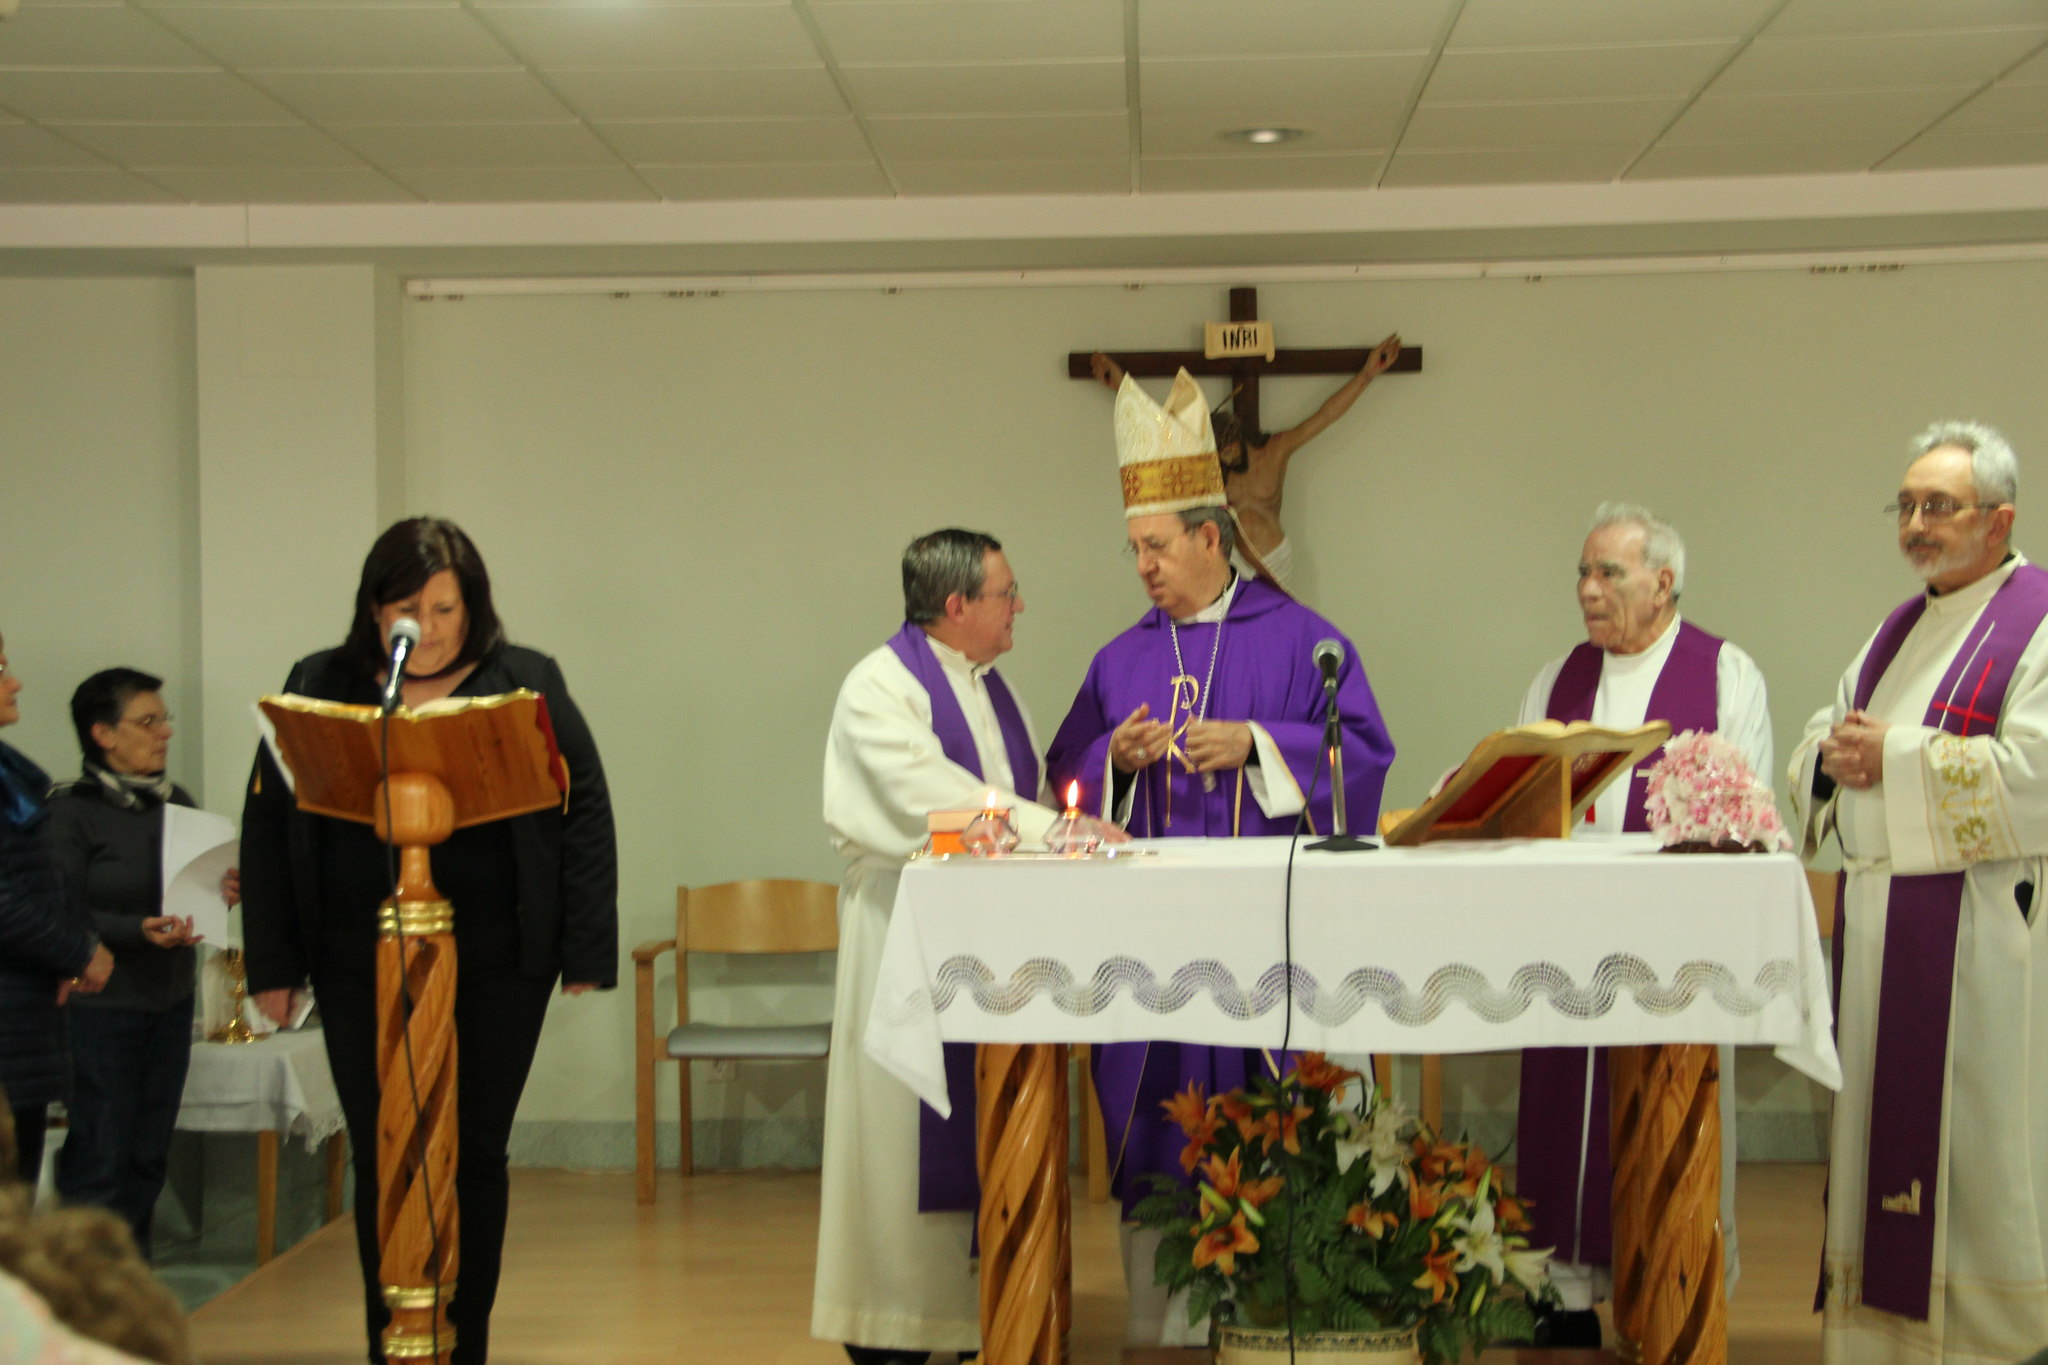 (2016-02-13) - Inauguración Virgen De Lourdes, La Molineta - Archivo La Molineta (004)